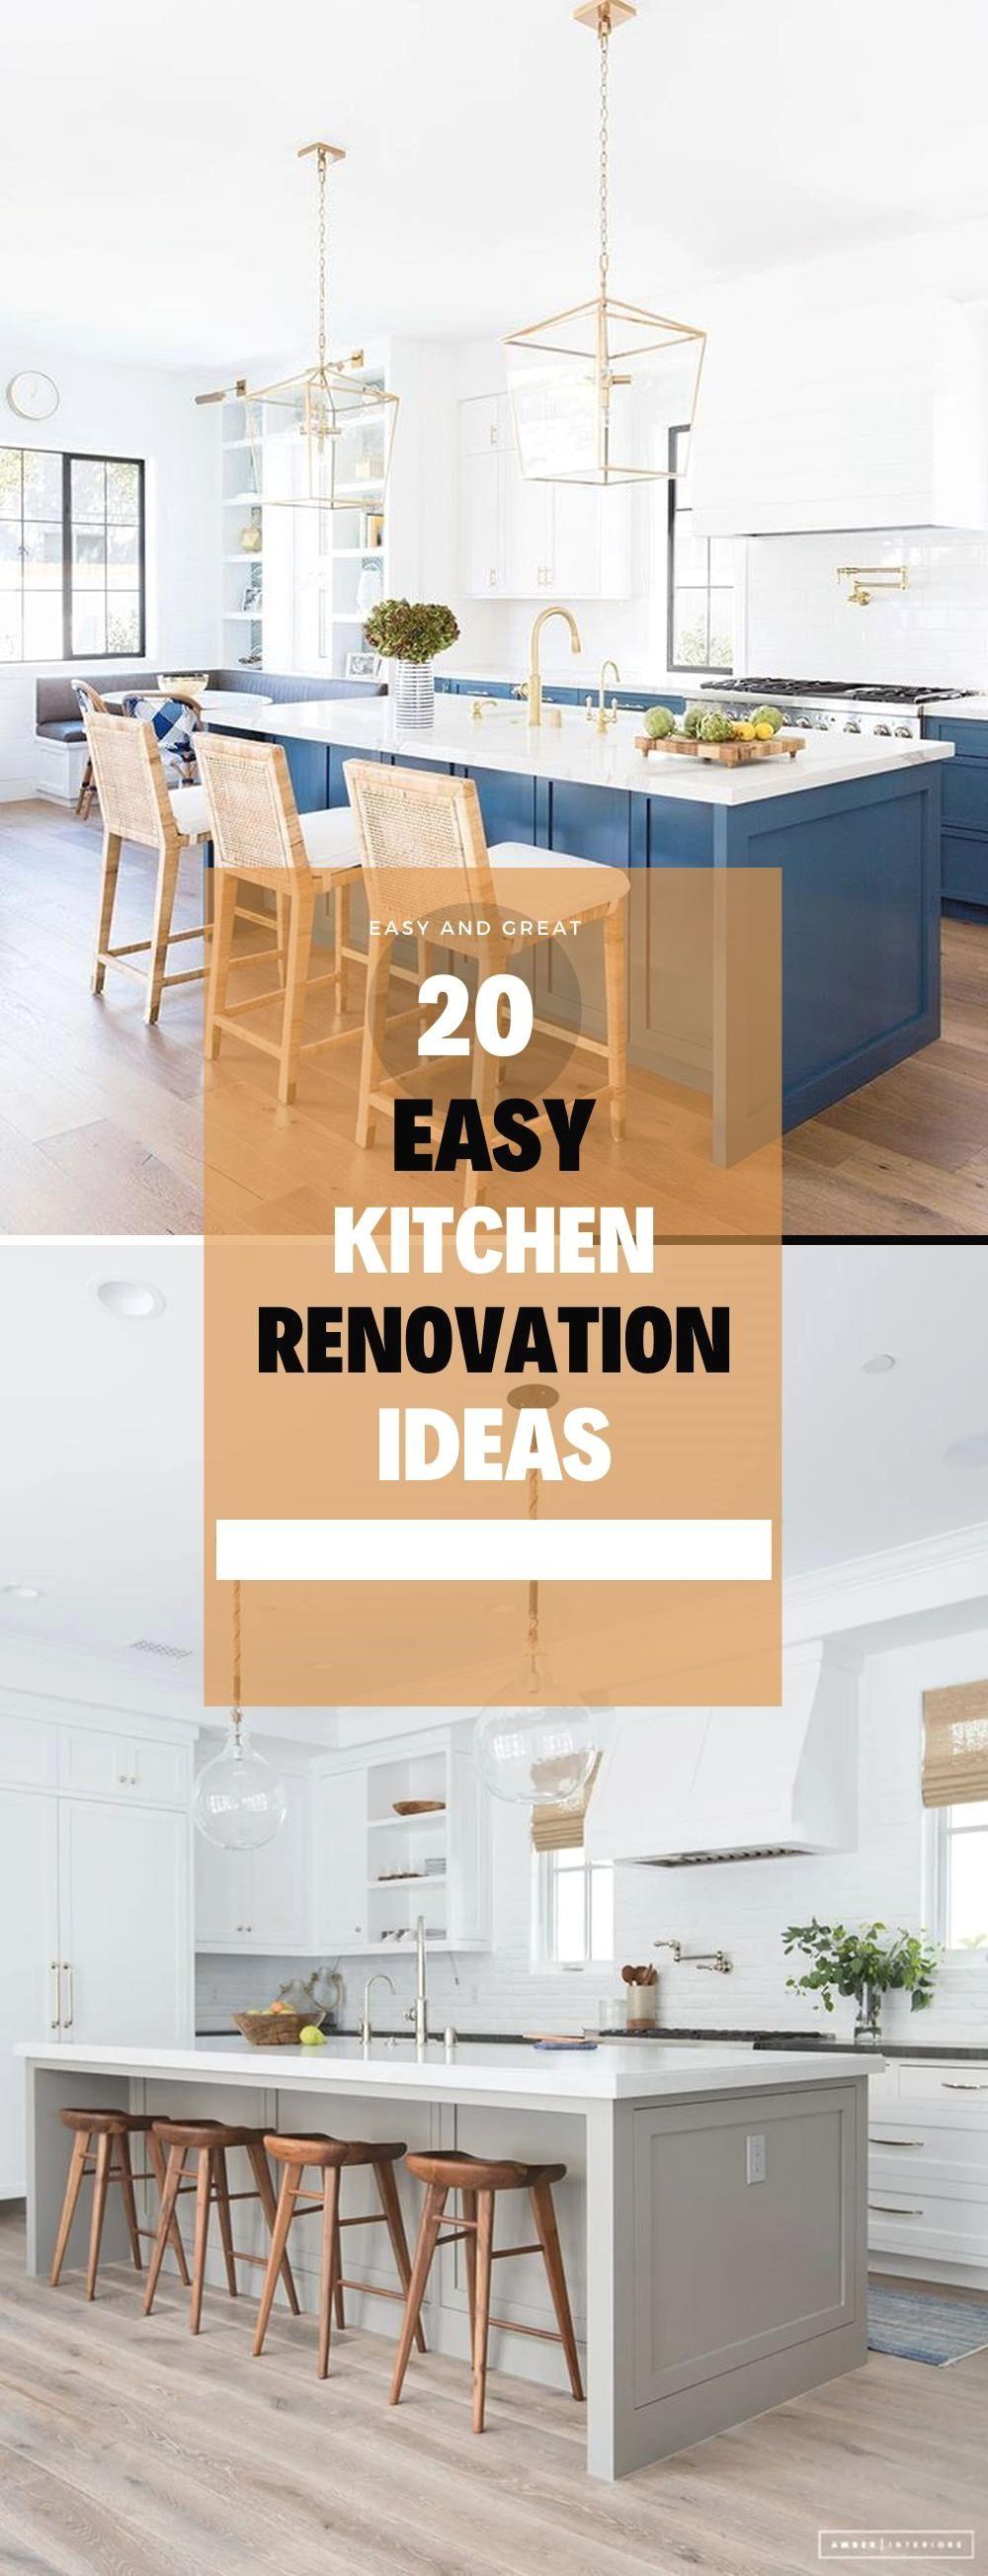 Easy DIY Ideas to Remodel Your Kitchen in 9   Diy kitchen ...